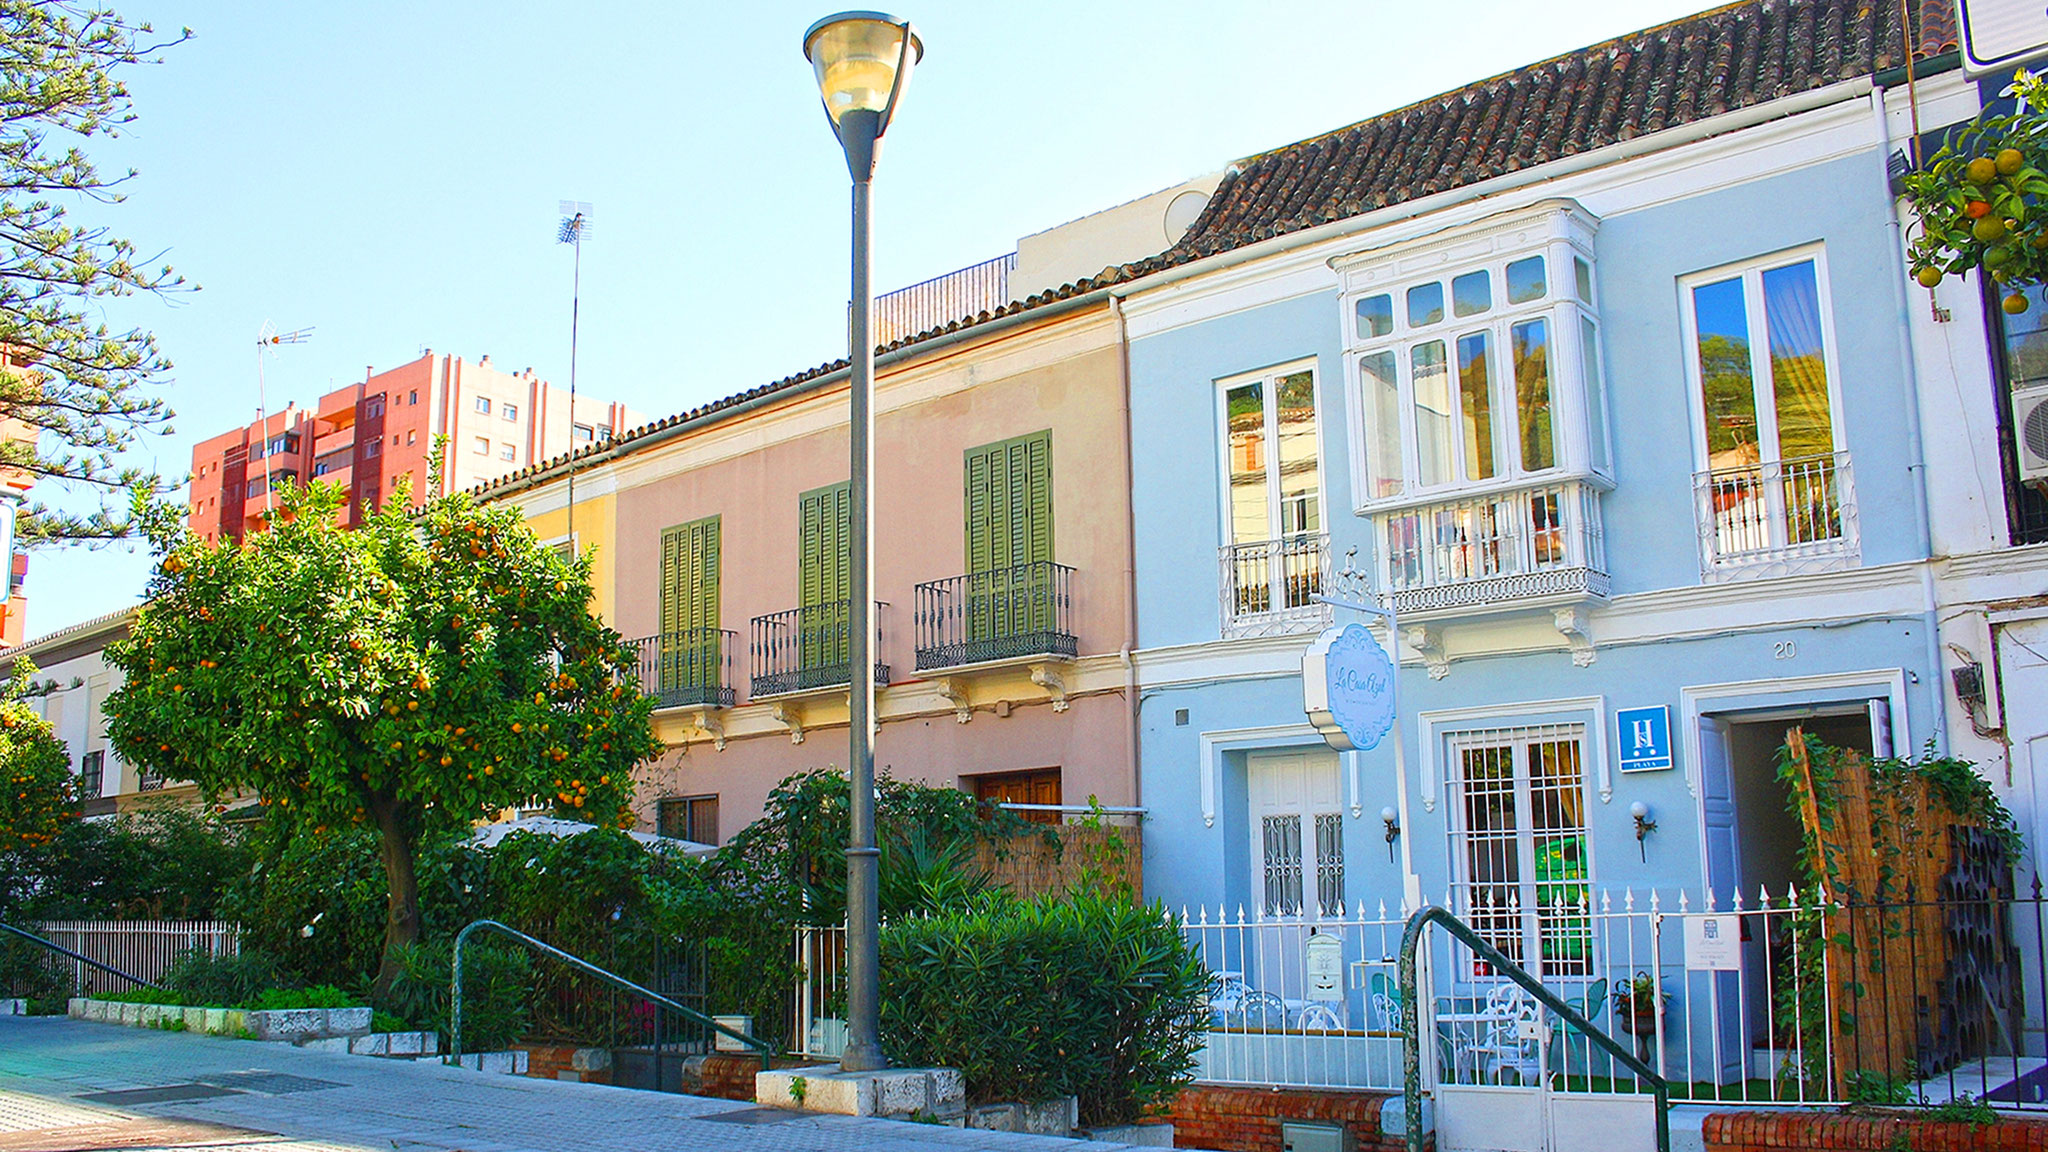 Home inicio la casa azul b b apartments - Casa home malaga ...